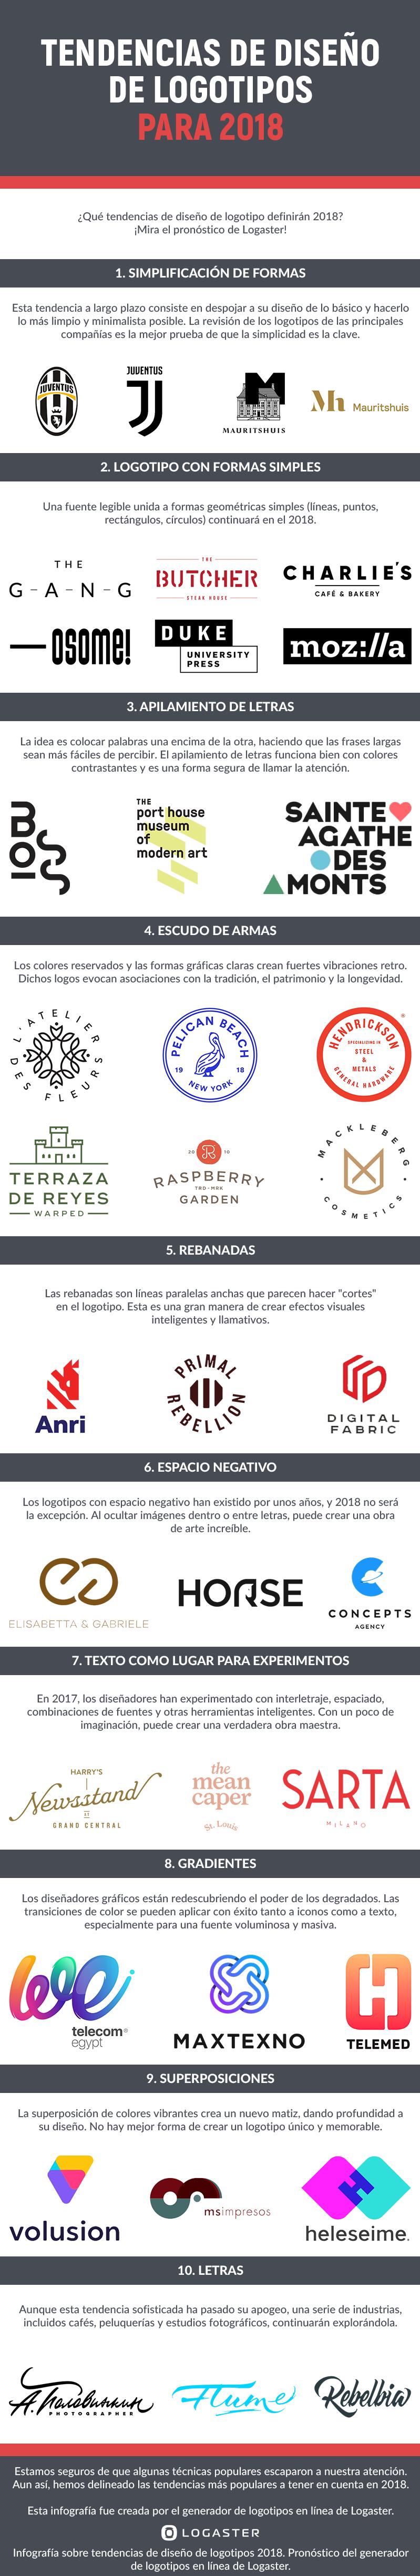 Tendencias en diseño de logos 2018